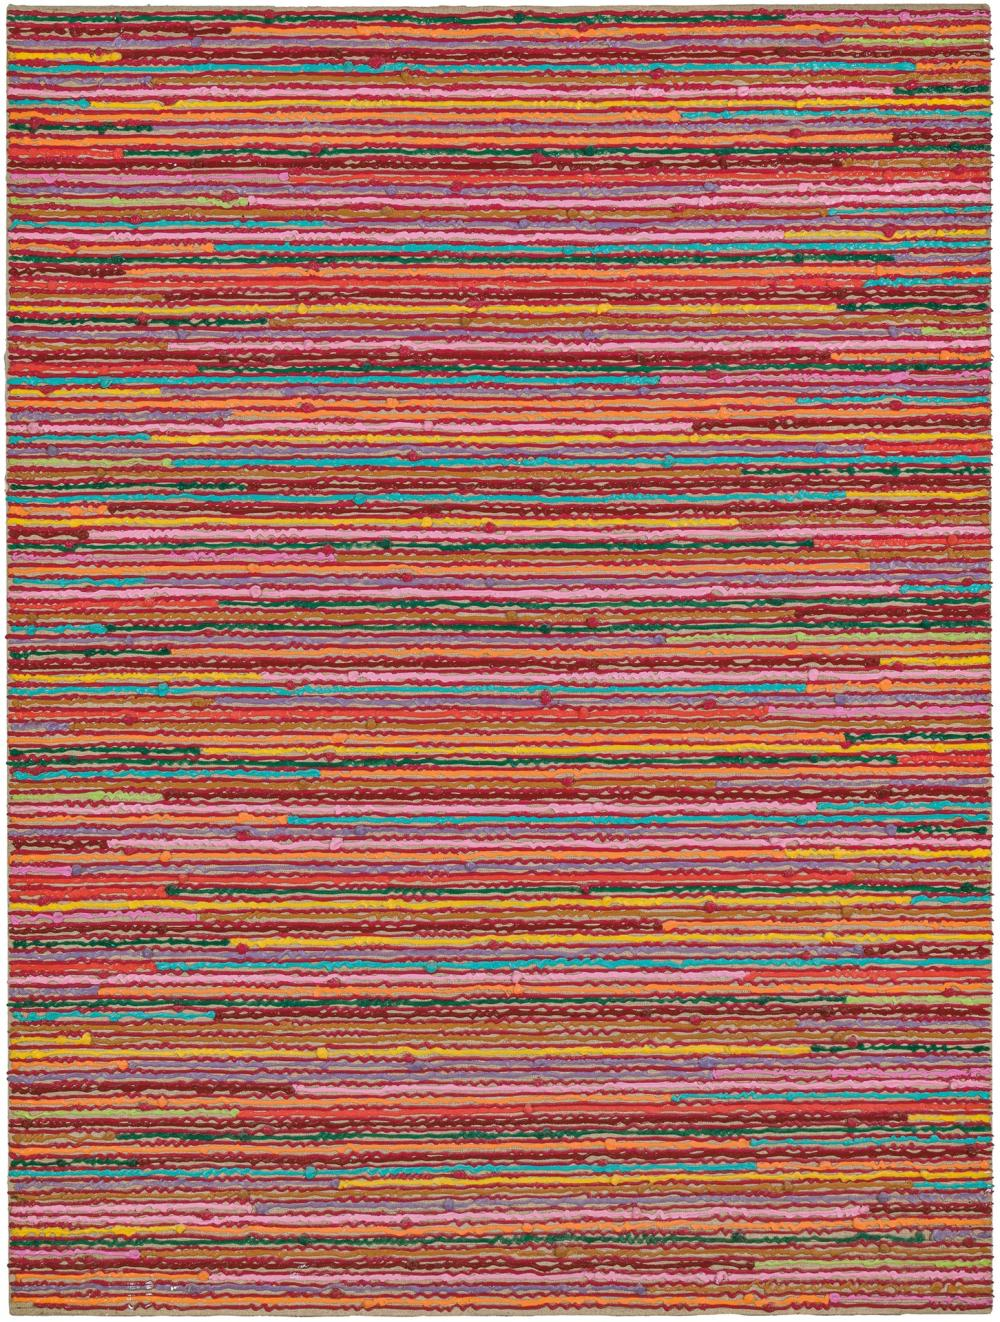 "PAUL SHARITS, American (b. 1943), ""For Peach II"", acrylic on canvas, 36 x 48 inches"